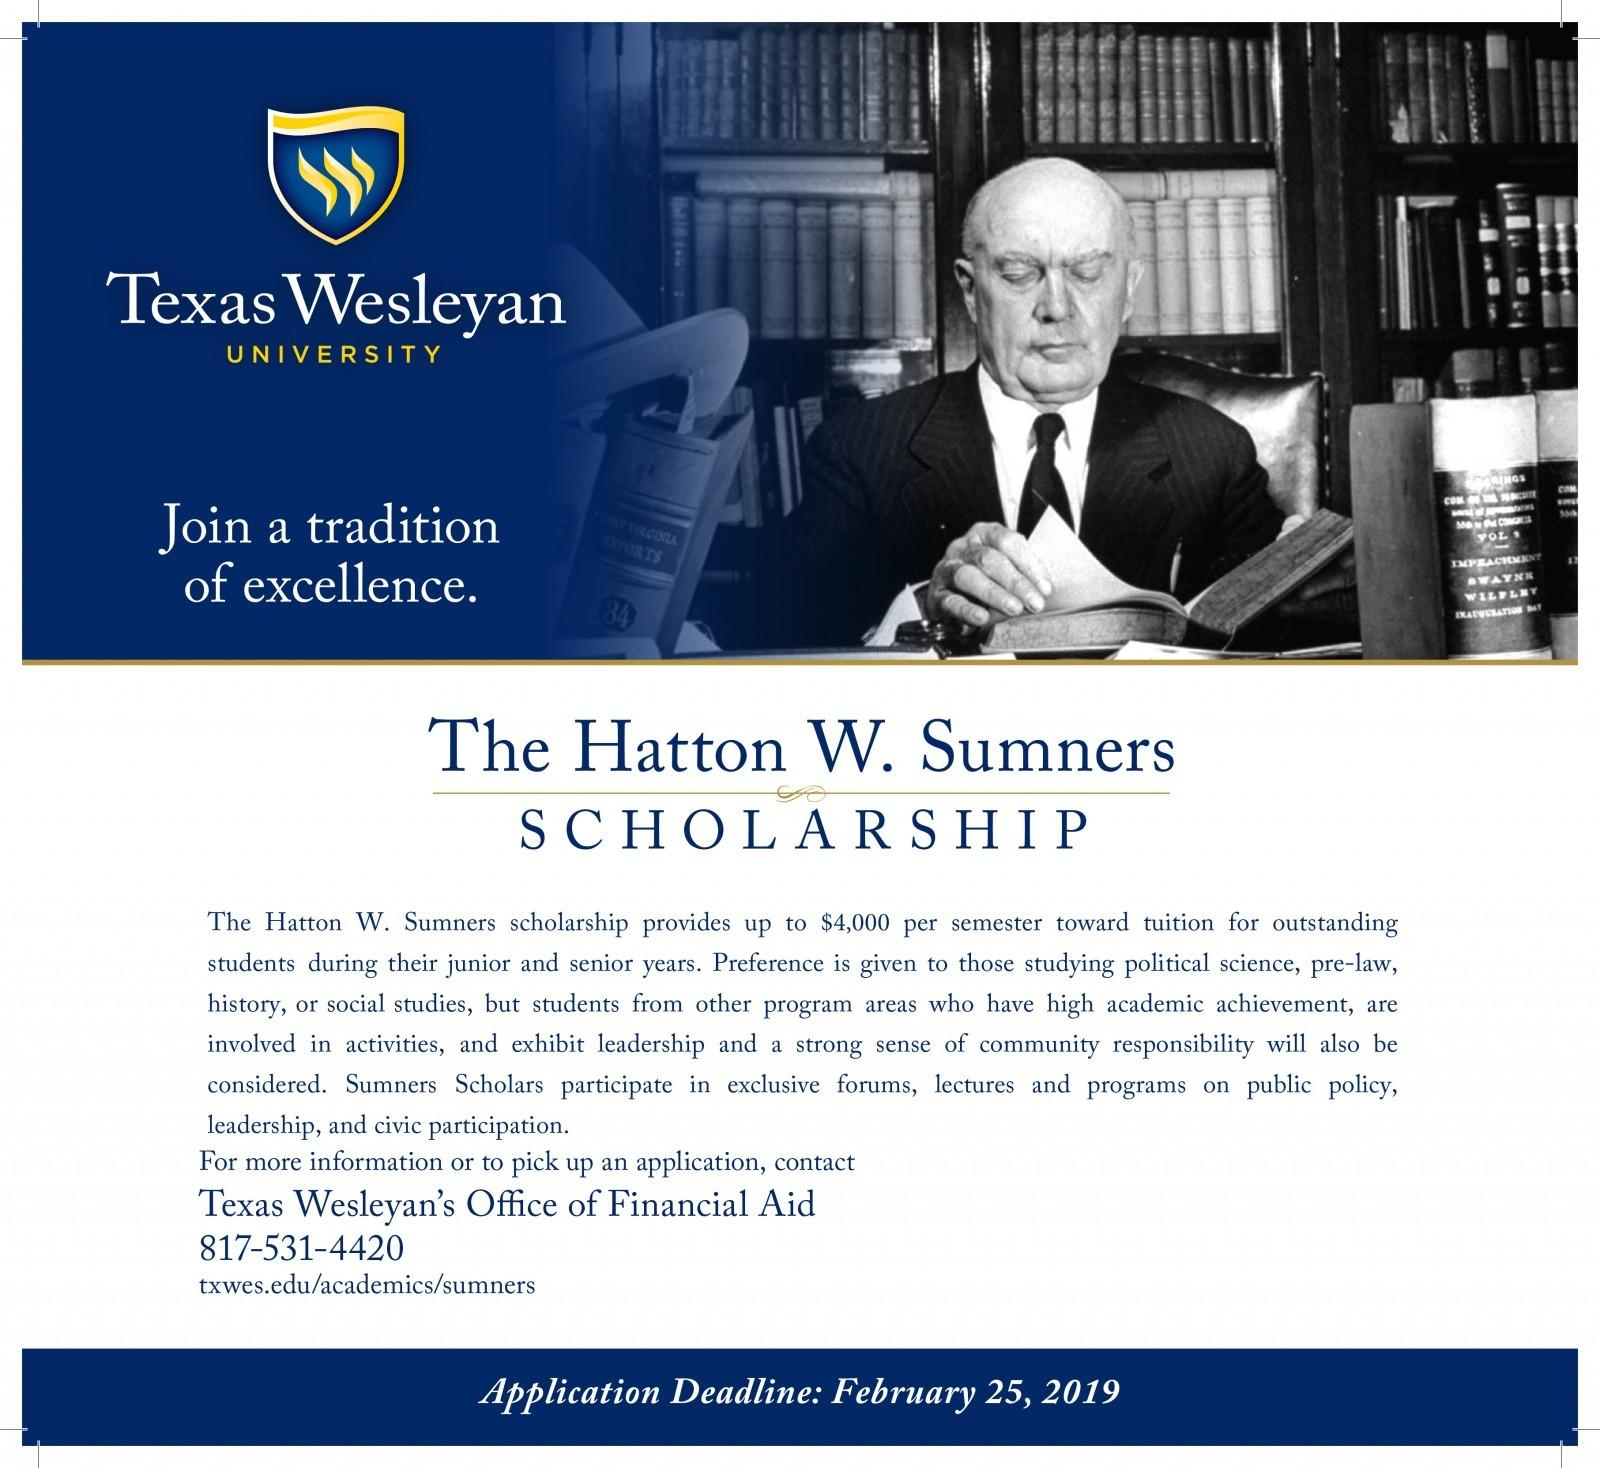 Hatton Sumners Scholarship 2019